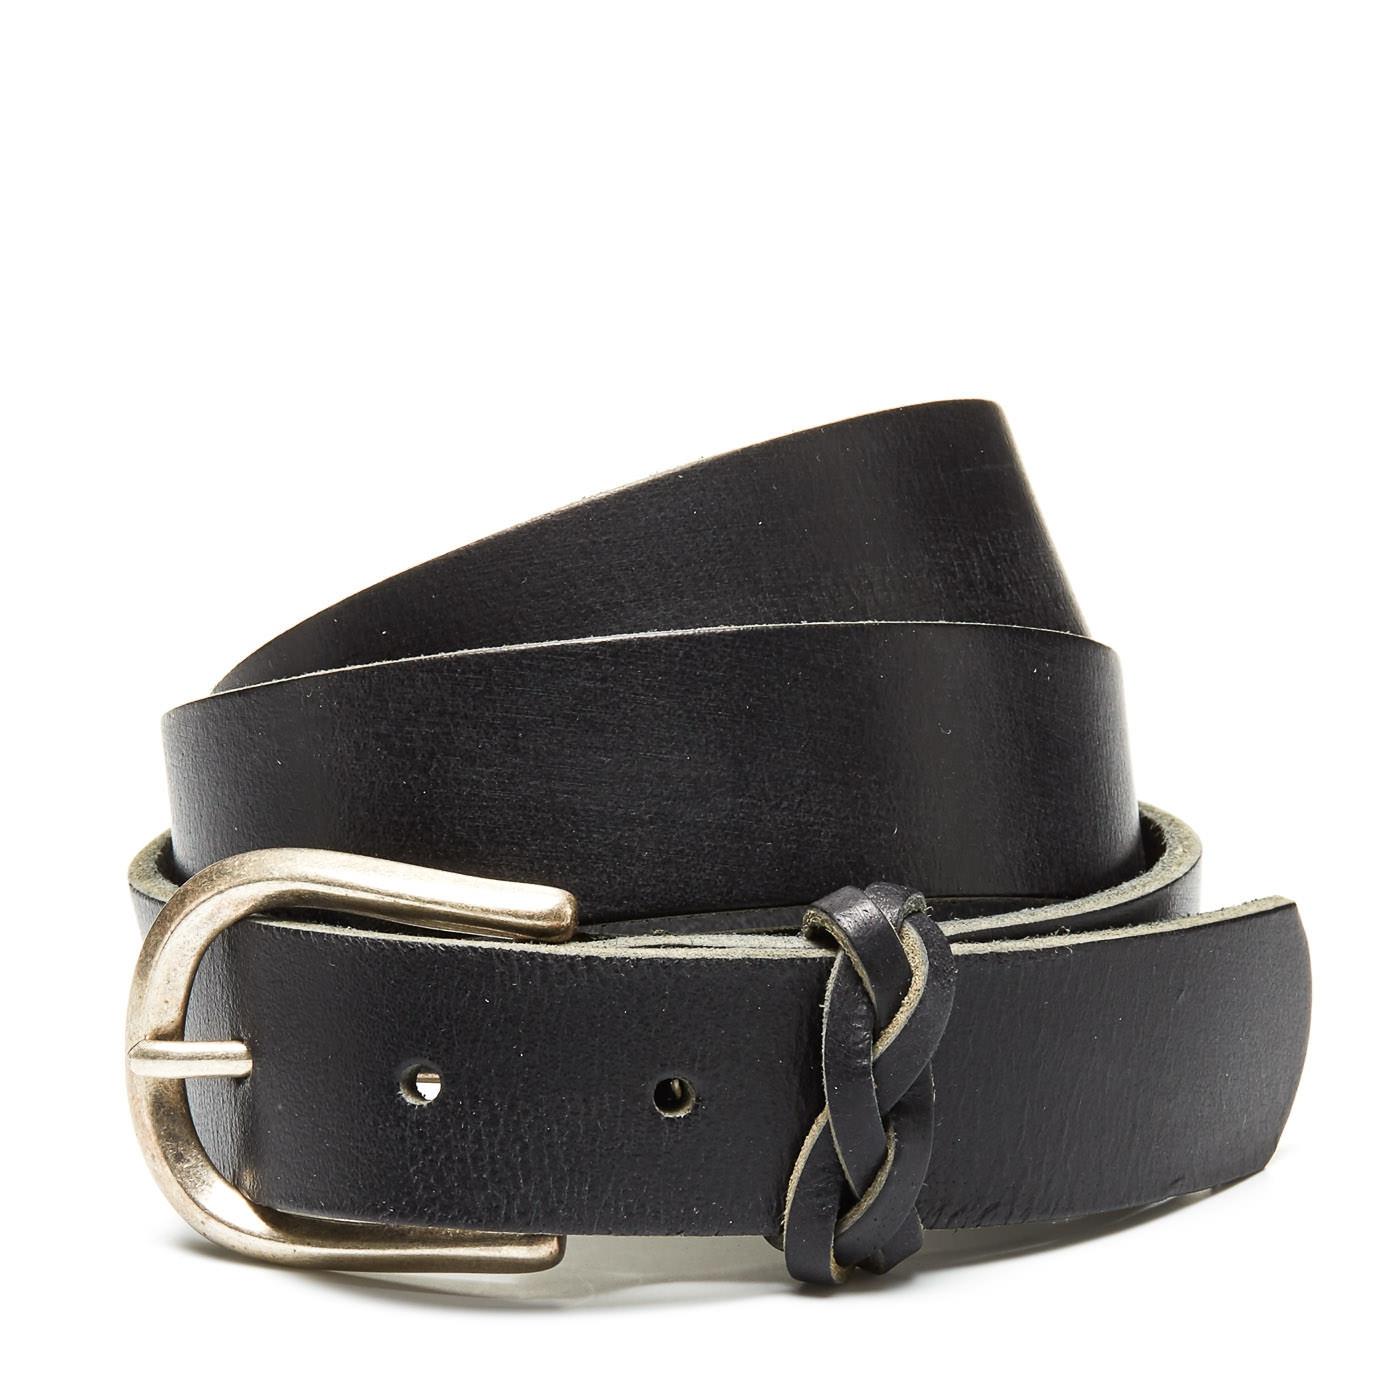 Cowboysbelt Black Dames Riem 302003-000100